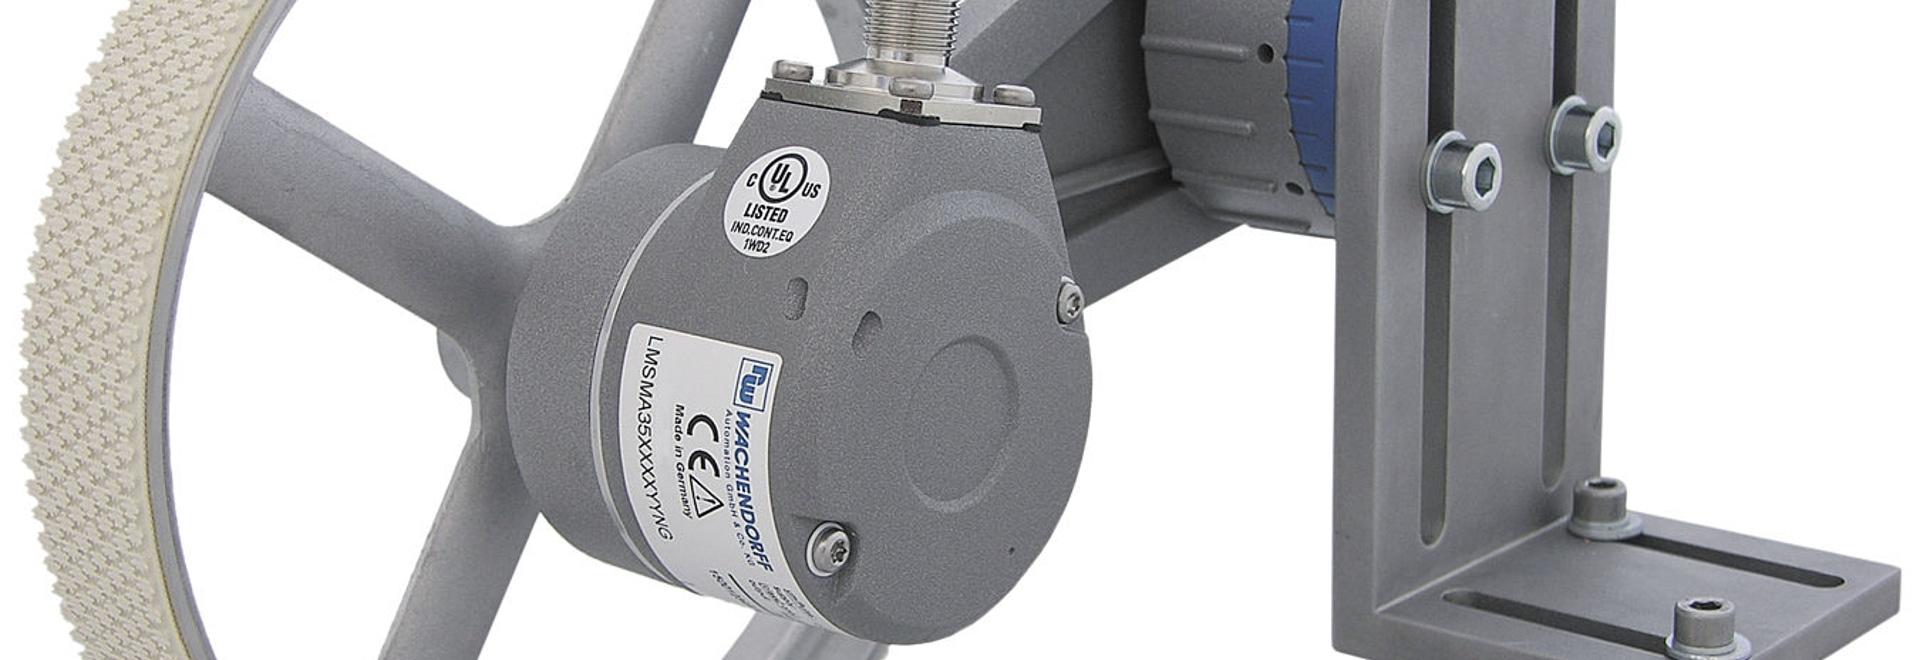 Length measurement system LMSMA2x/3x